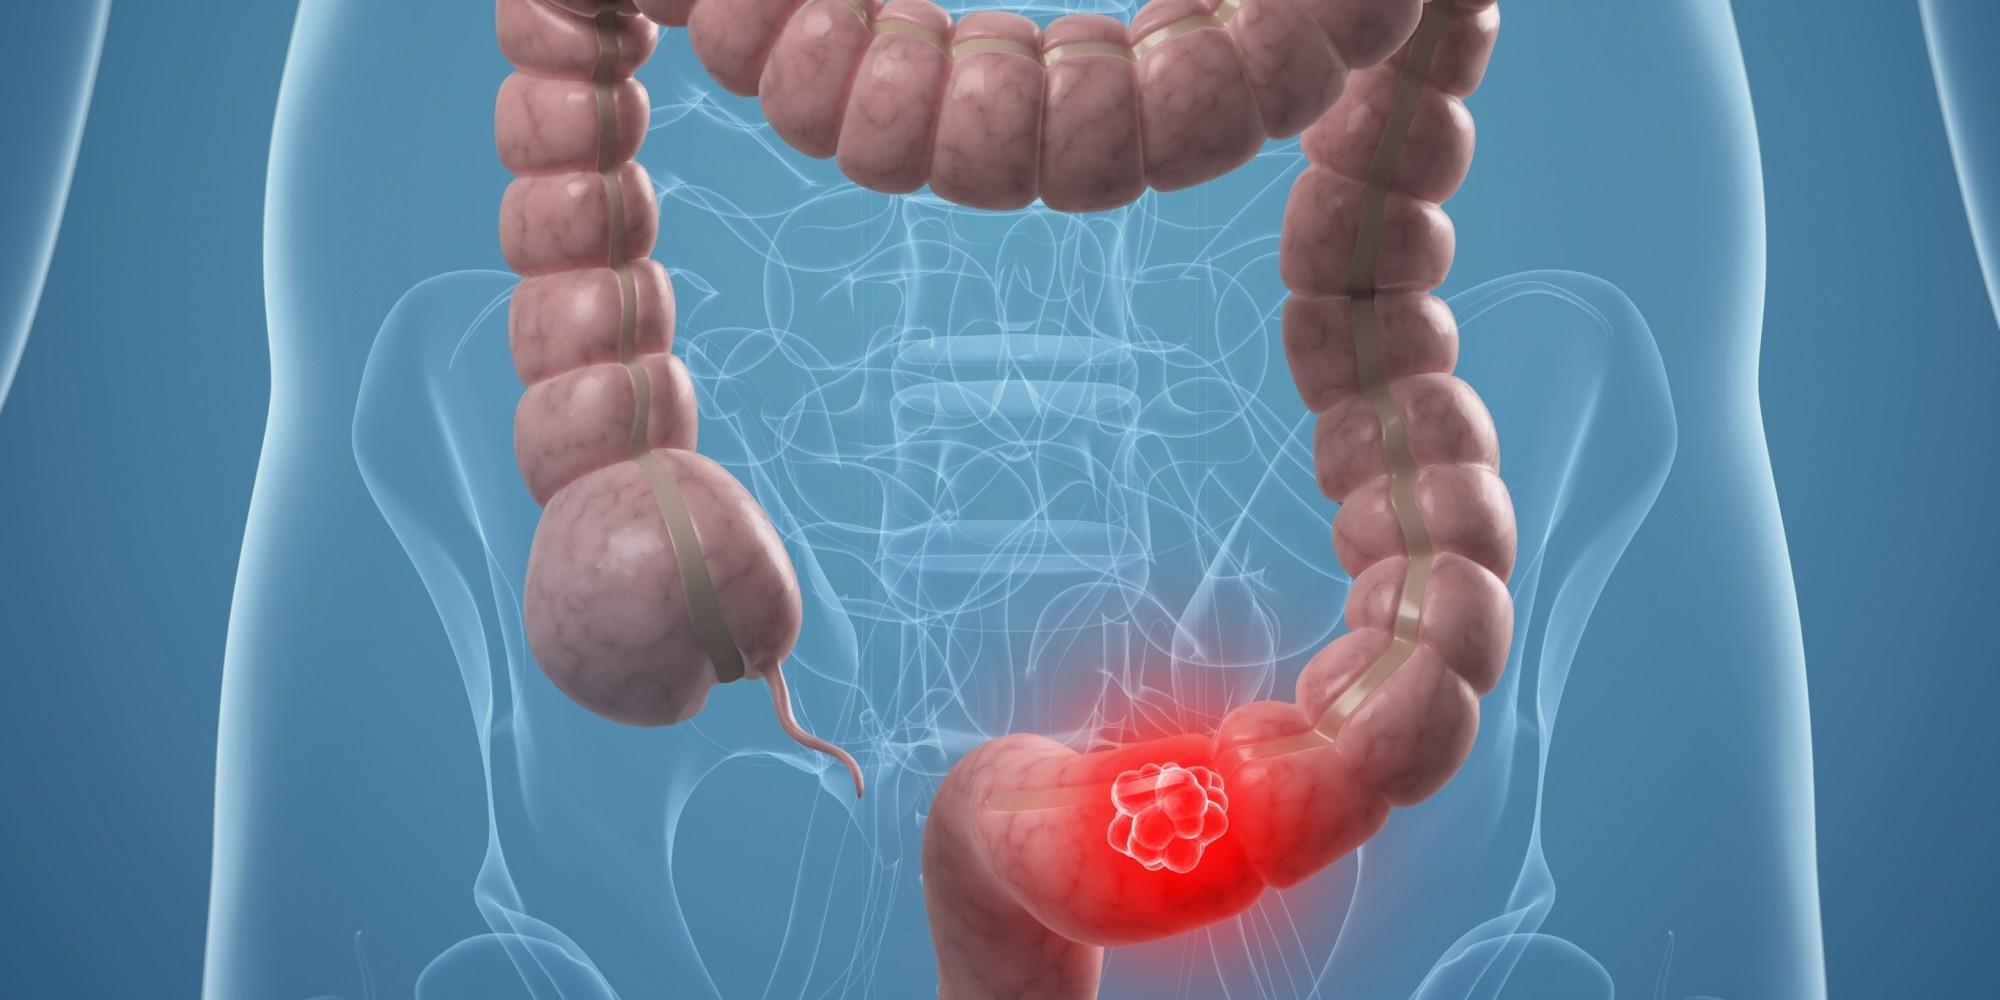 cancer-colon-shcema-intestin.jpg